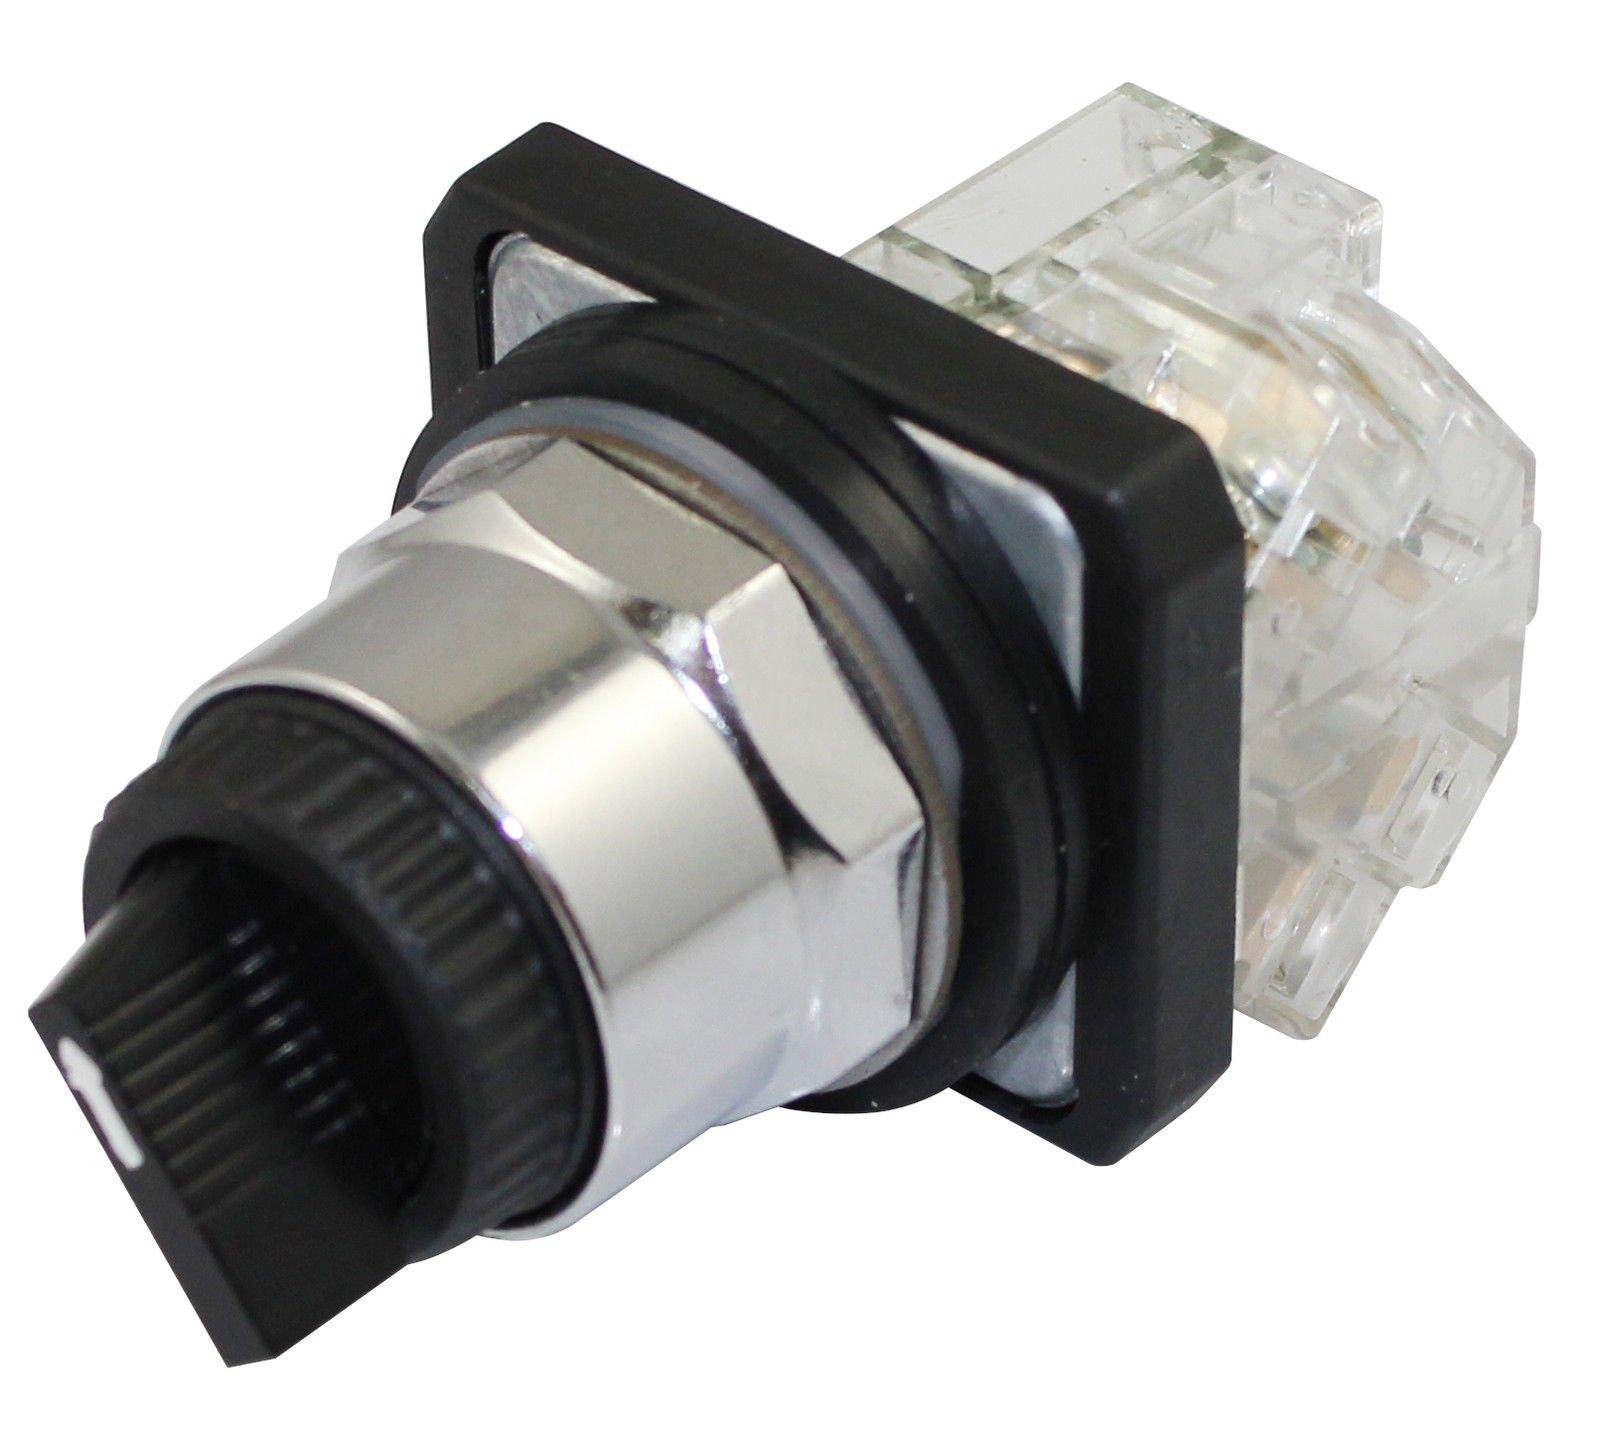 Suns International PBM30-S2ME-B-P1 PBM30 Series 2 Position 30 mm Stay Put Metal Bezel Selector Switch - 1 Item(s)